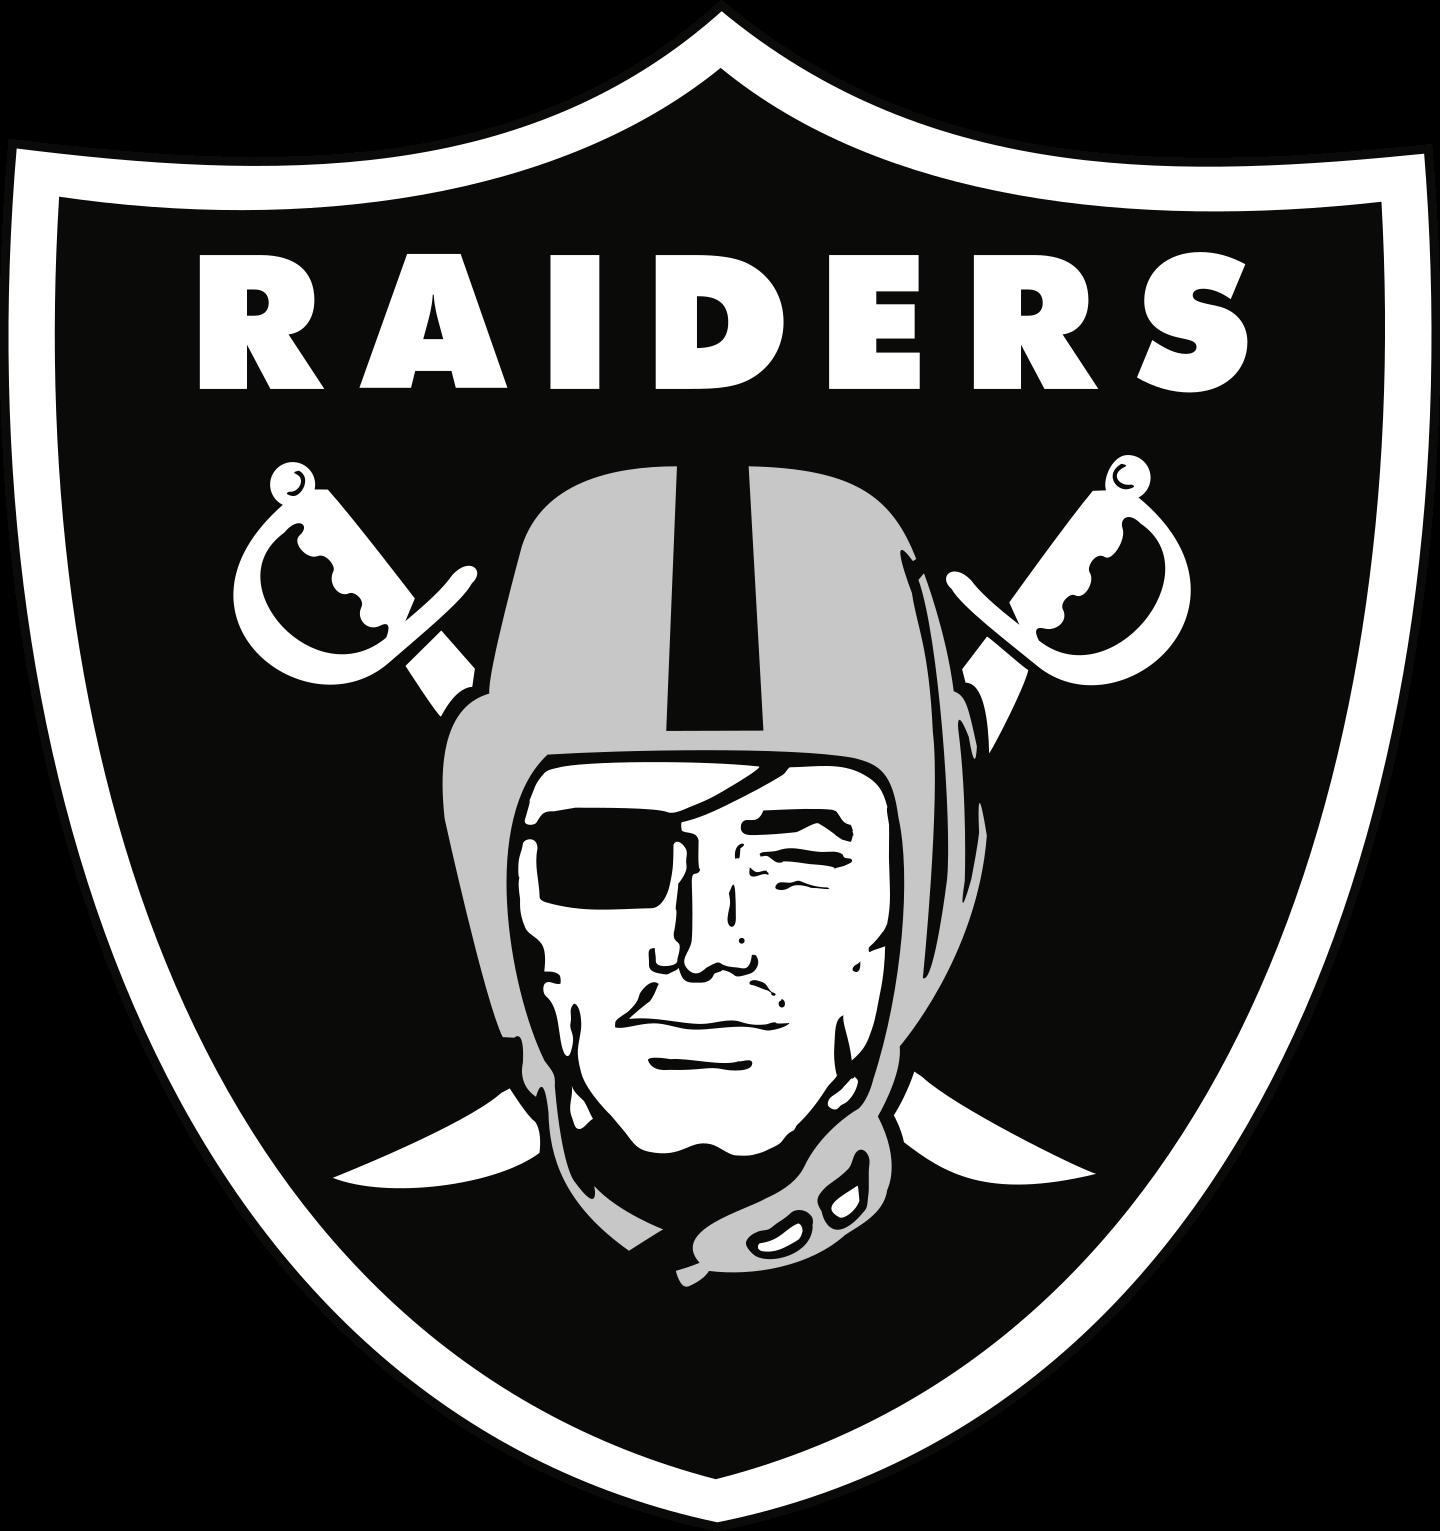 las vegas raiders logo 2 - Las Vegas Raiders Logo